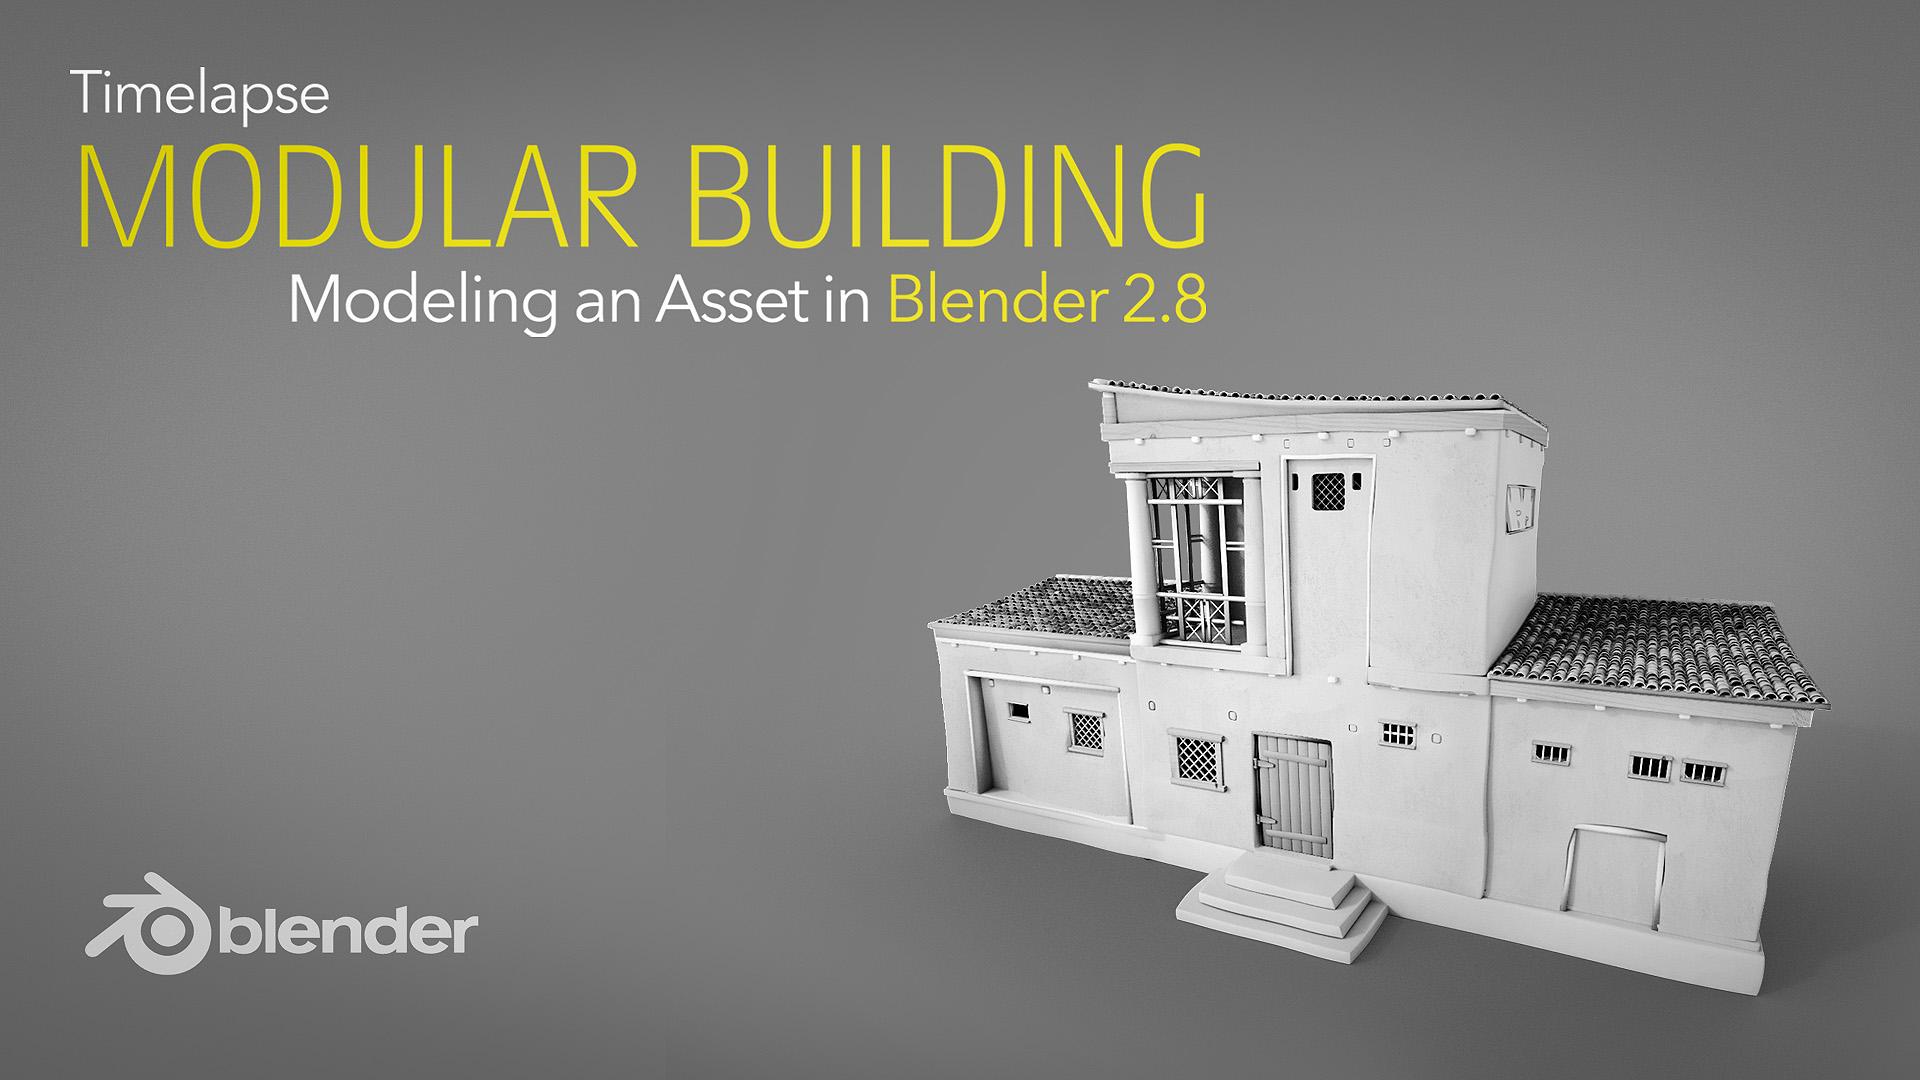 Timelapse Modeling A Modular Building Asset Blender 28